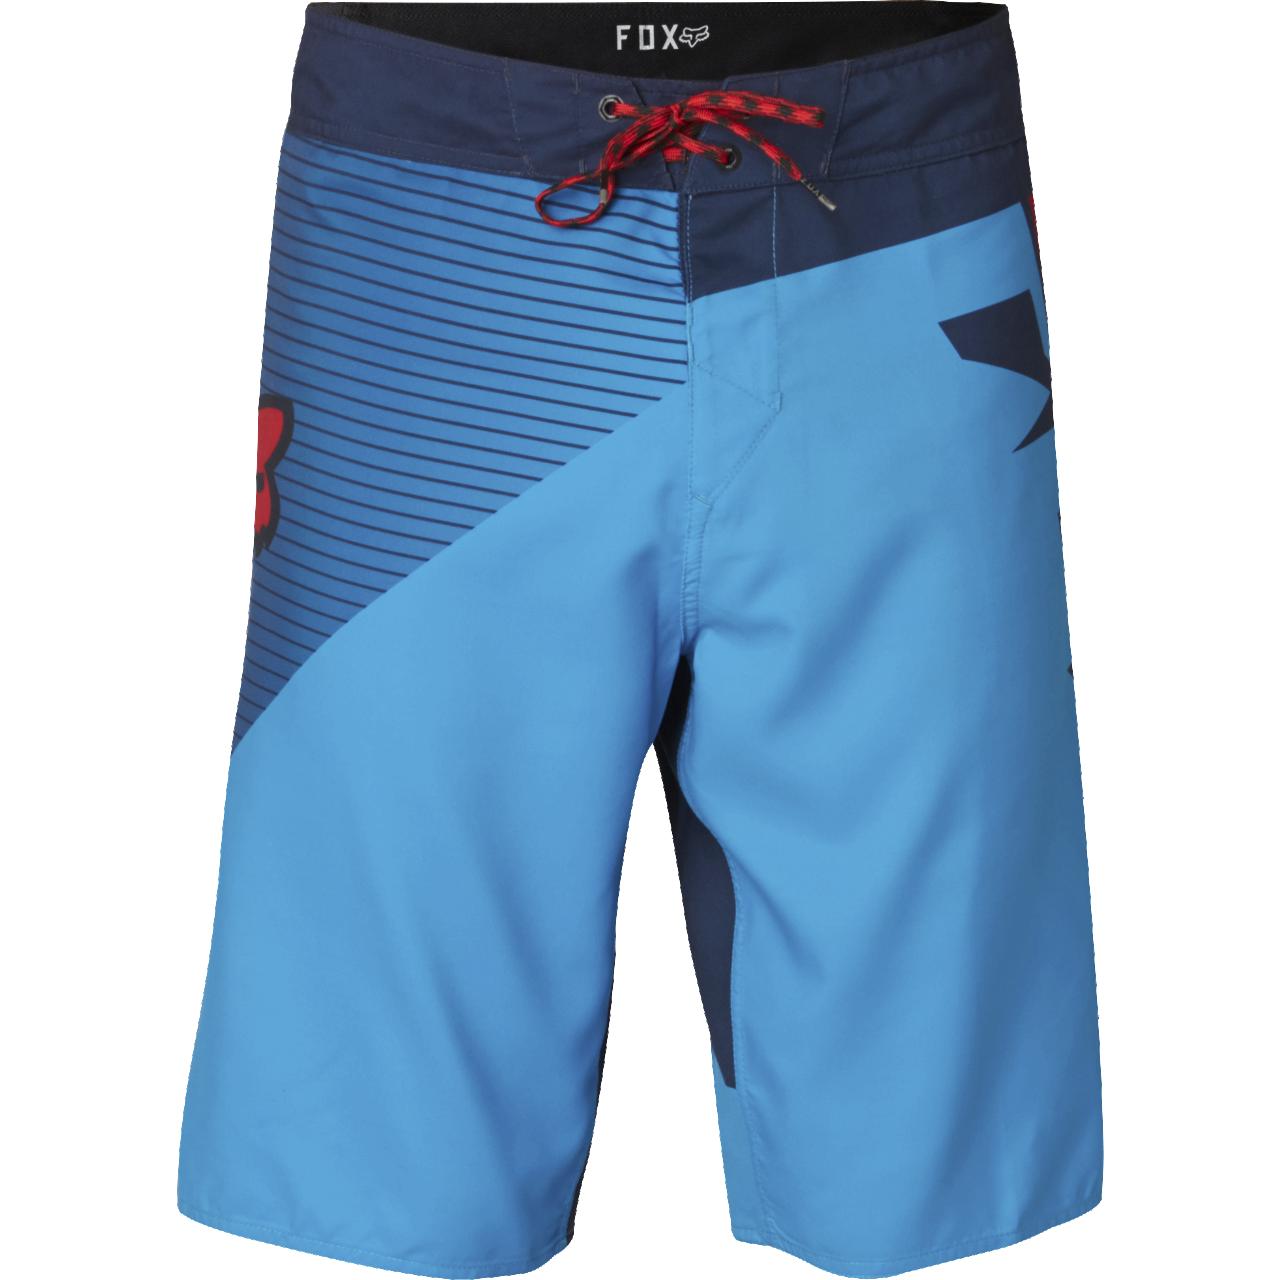 surf fox racing clothing